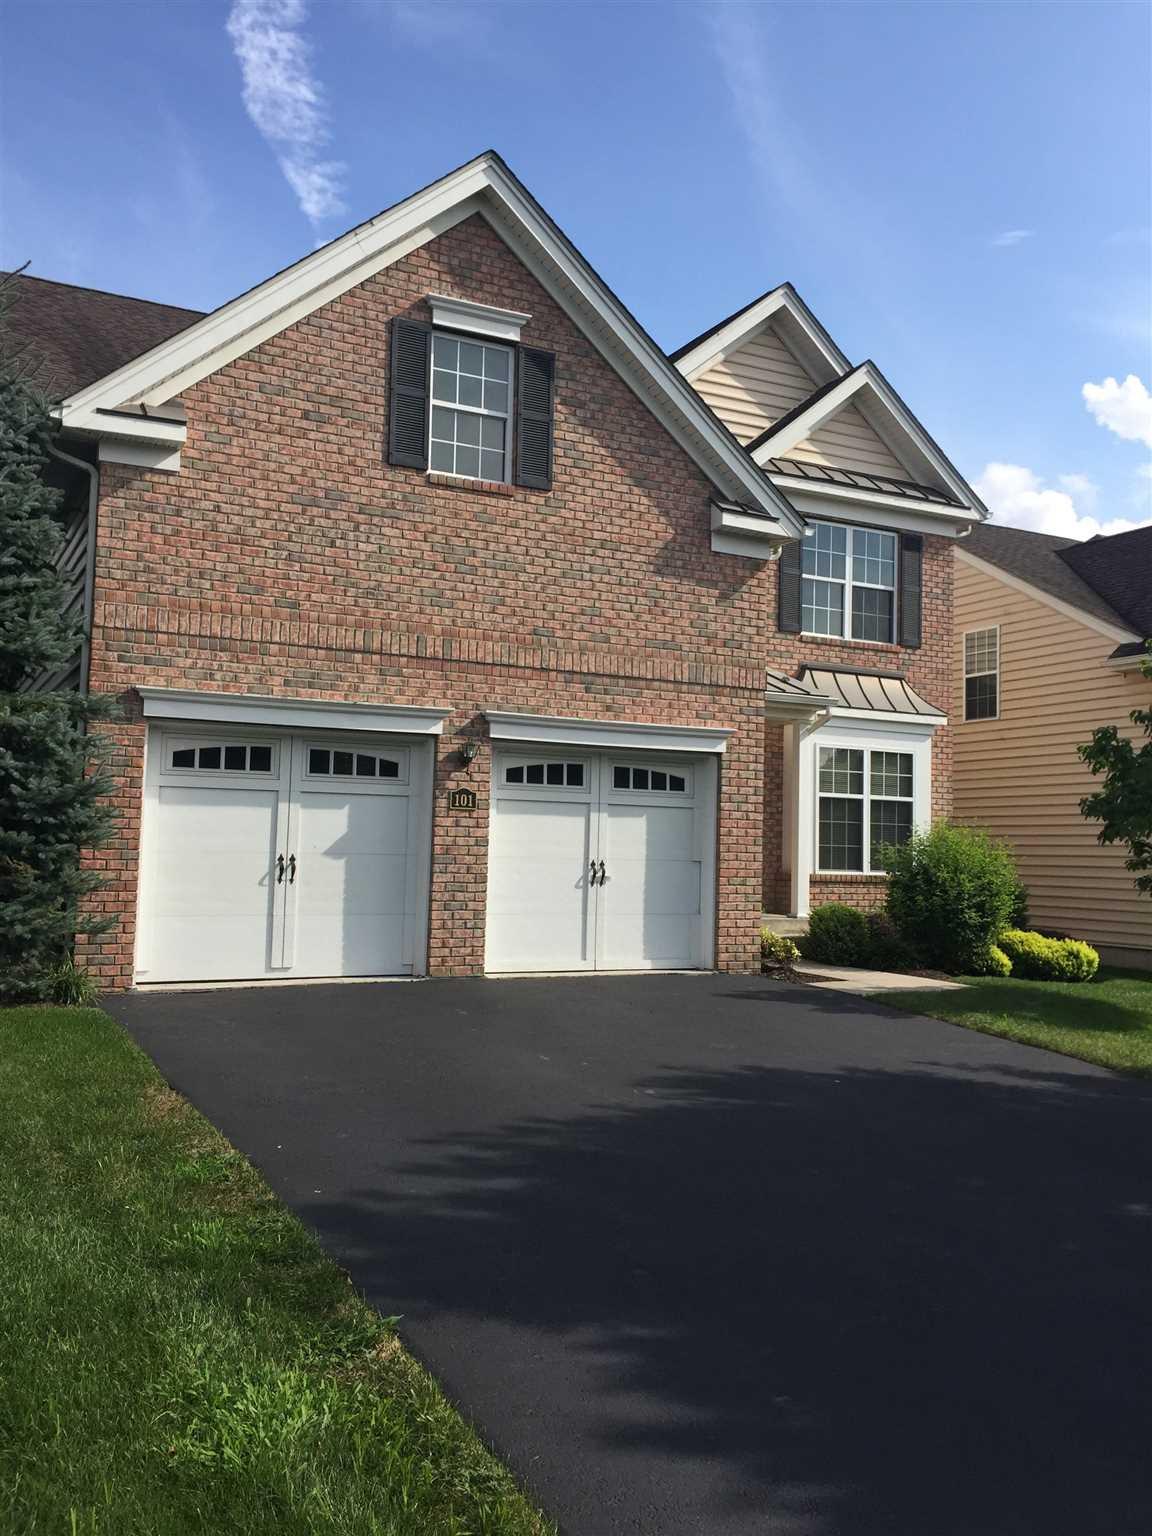 Single Family Home for Sale at 101 STONY BROOK Road 101 STONY BROOK Road Fishkill, New York 12508 United States